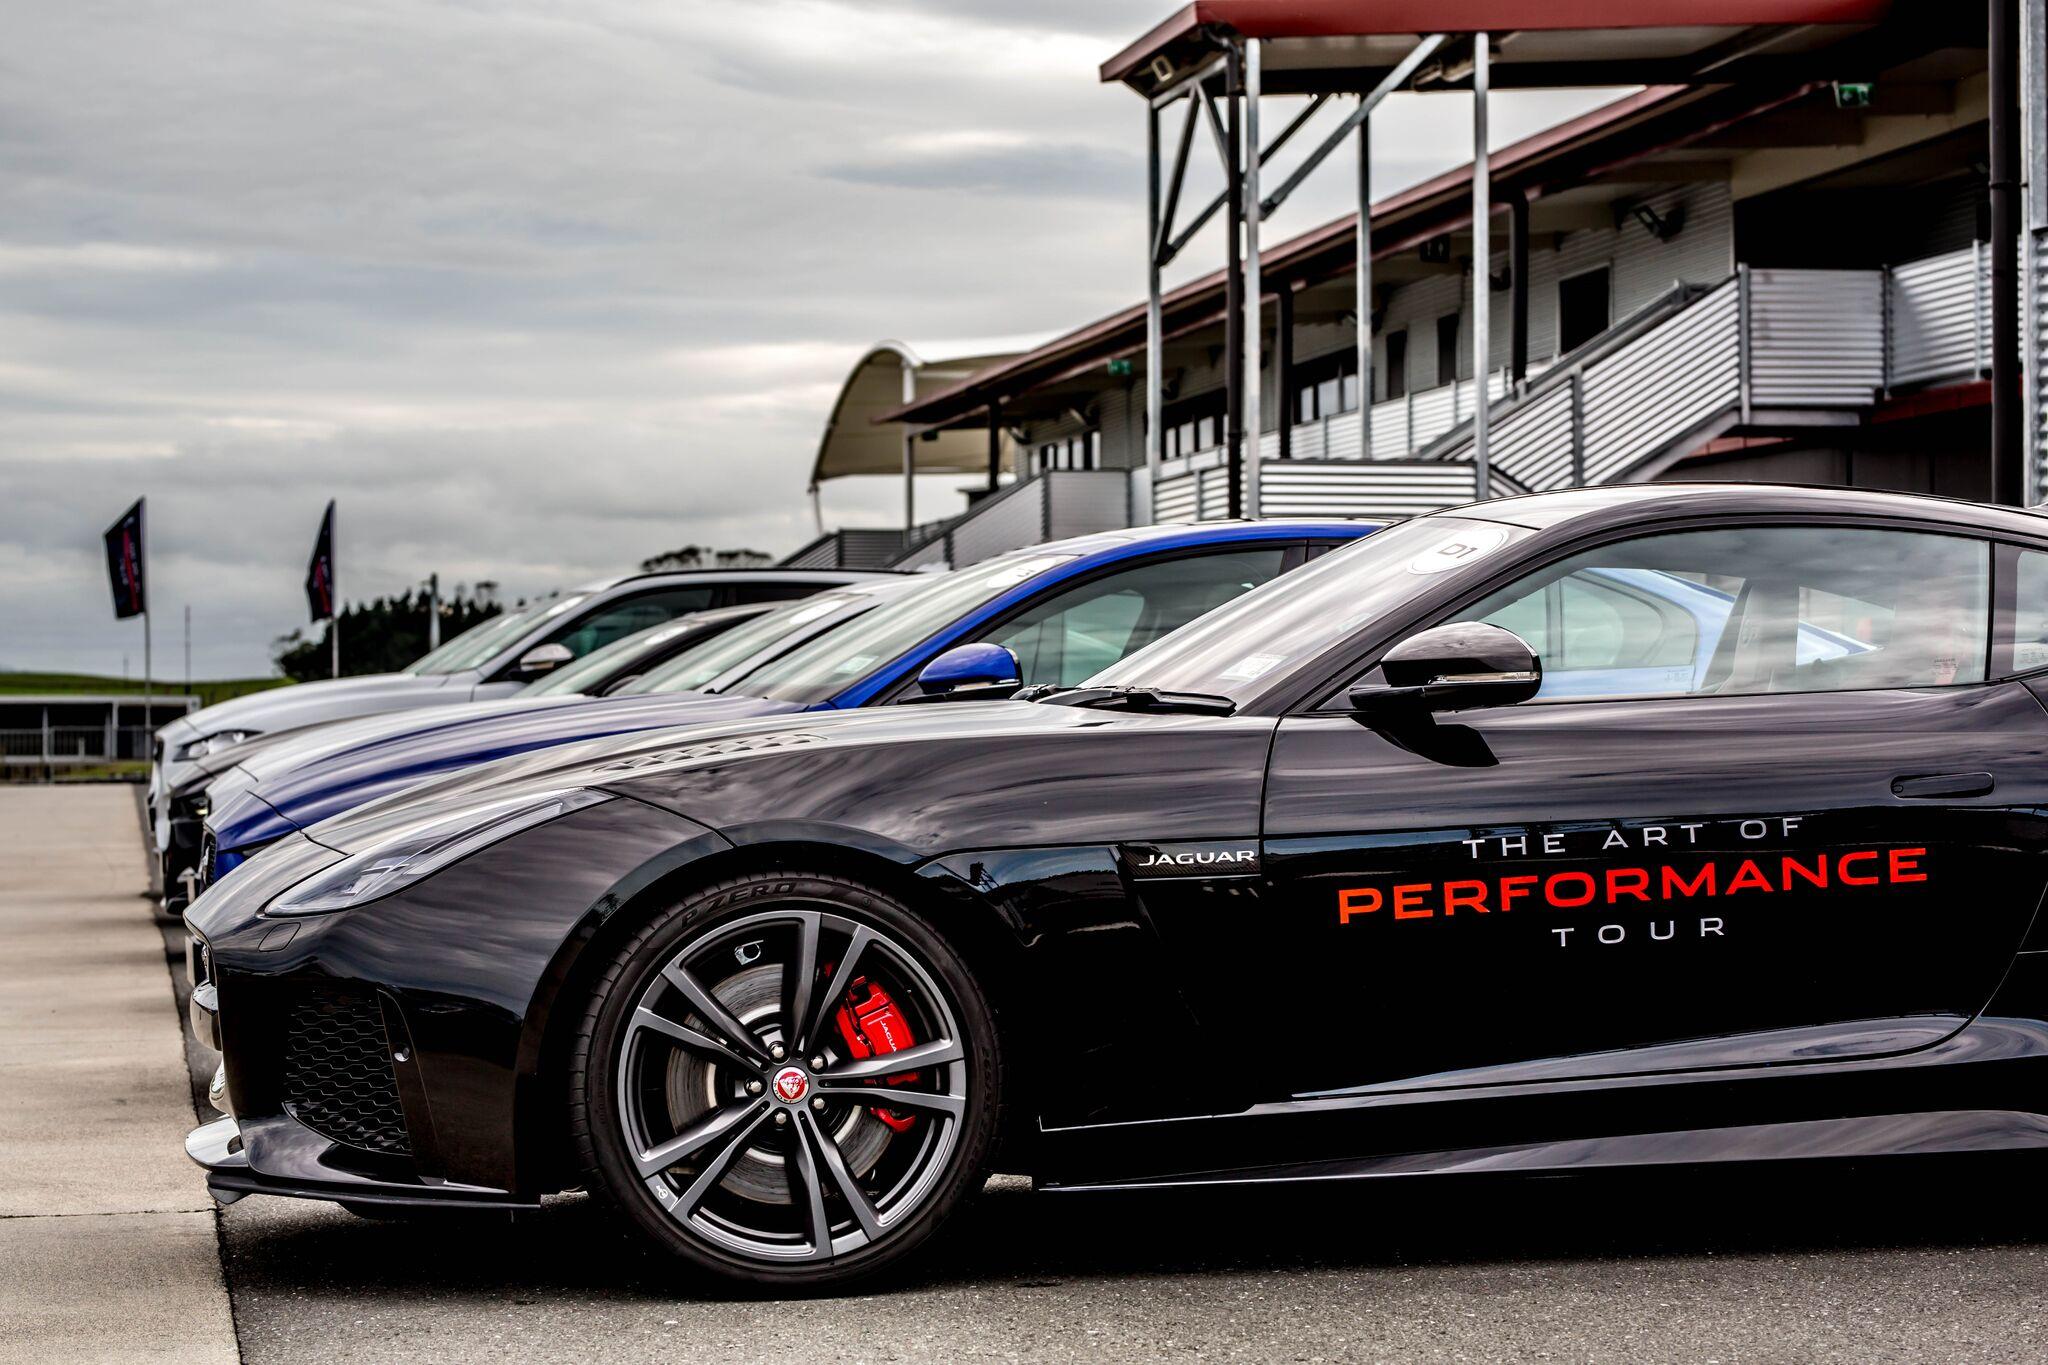 Jaguar - Art of Performance - THURS MORN  2MB-102_preview.jpeg